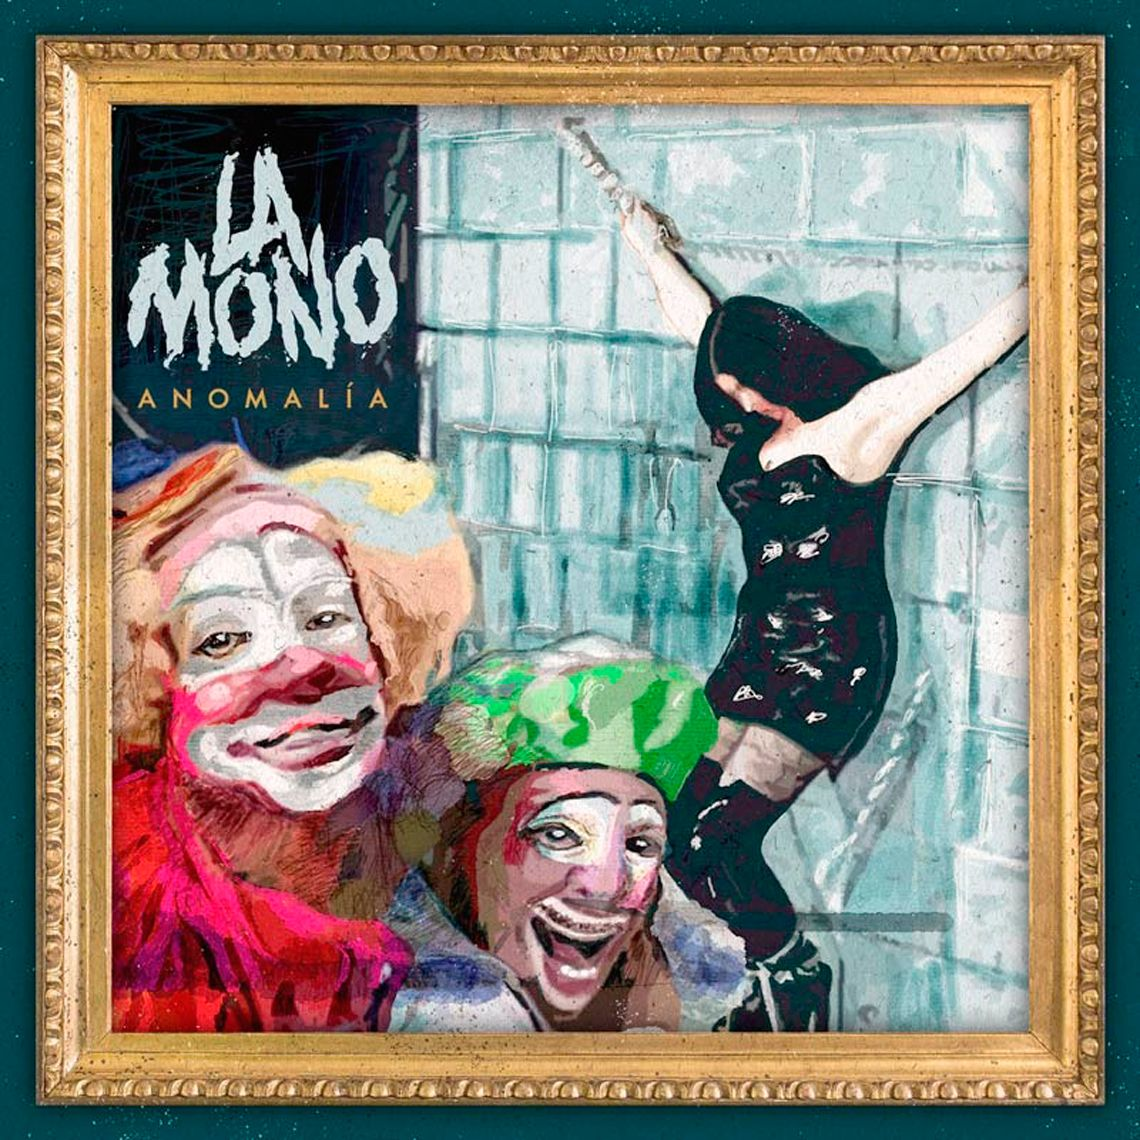 La Mono lanzó su segundo disco, con tapa ilustrada por el Indio Solari